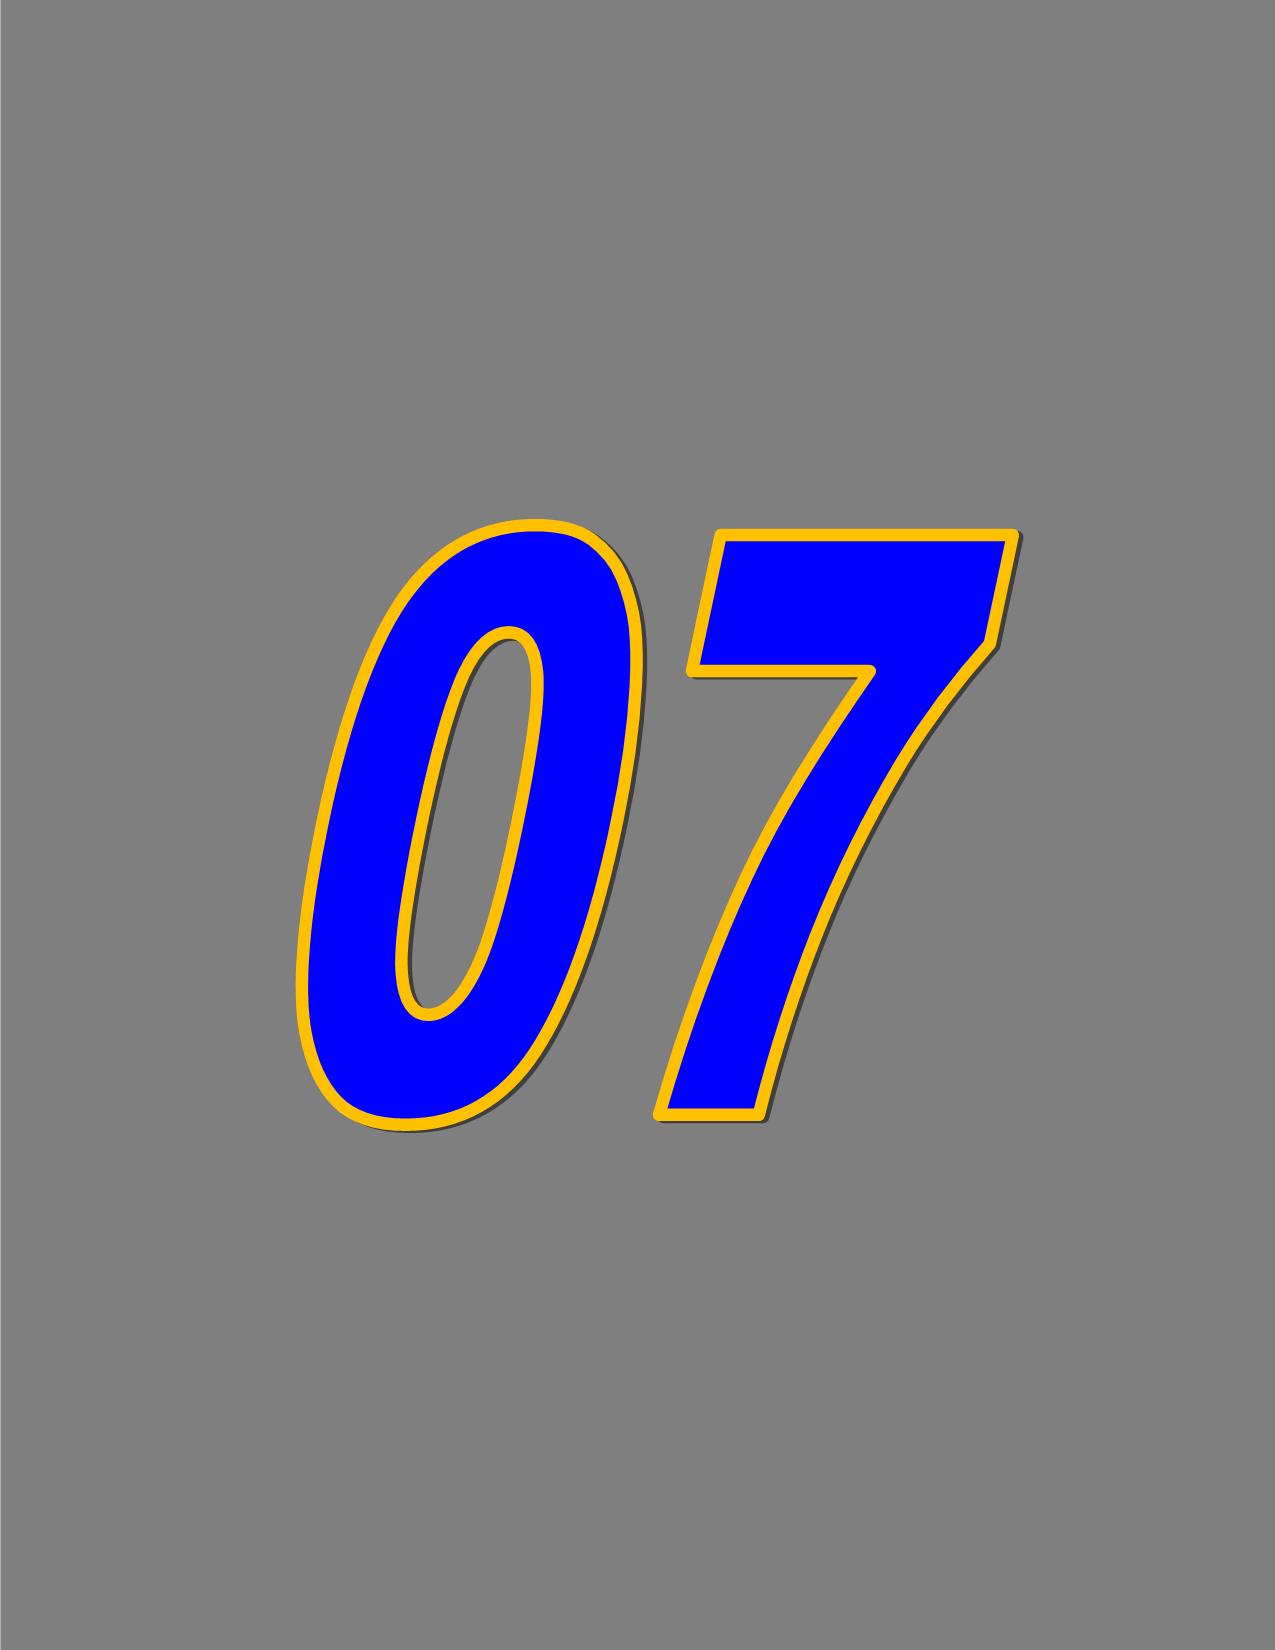 Number 07